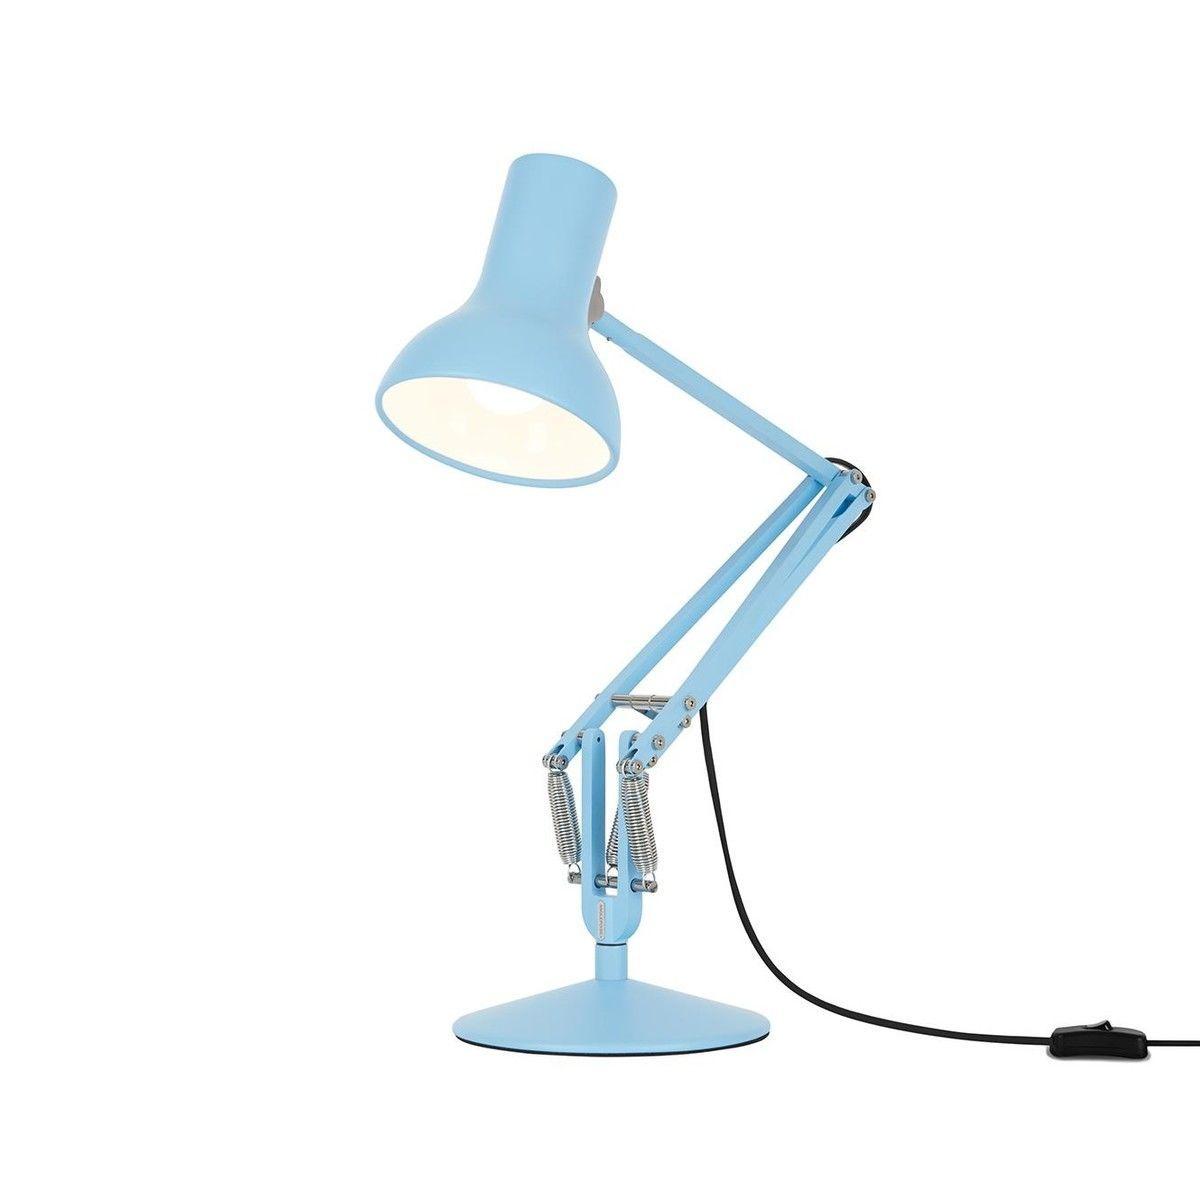 type 75 mini lampe de bureau led anglepoise. Black Bedroom Furniture Sets. Home Design Ideas